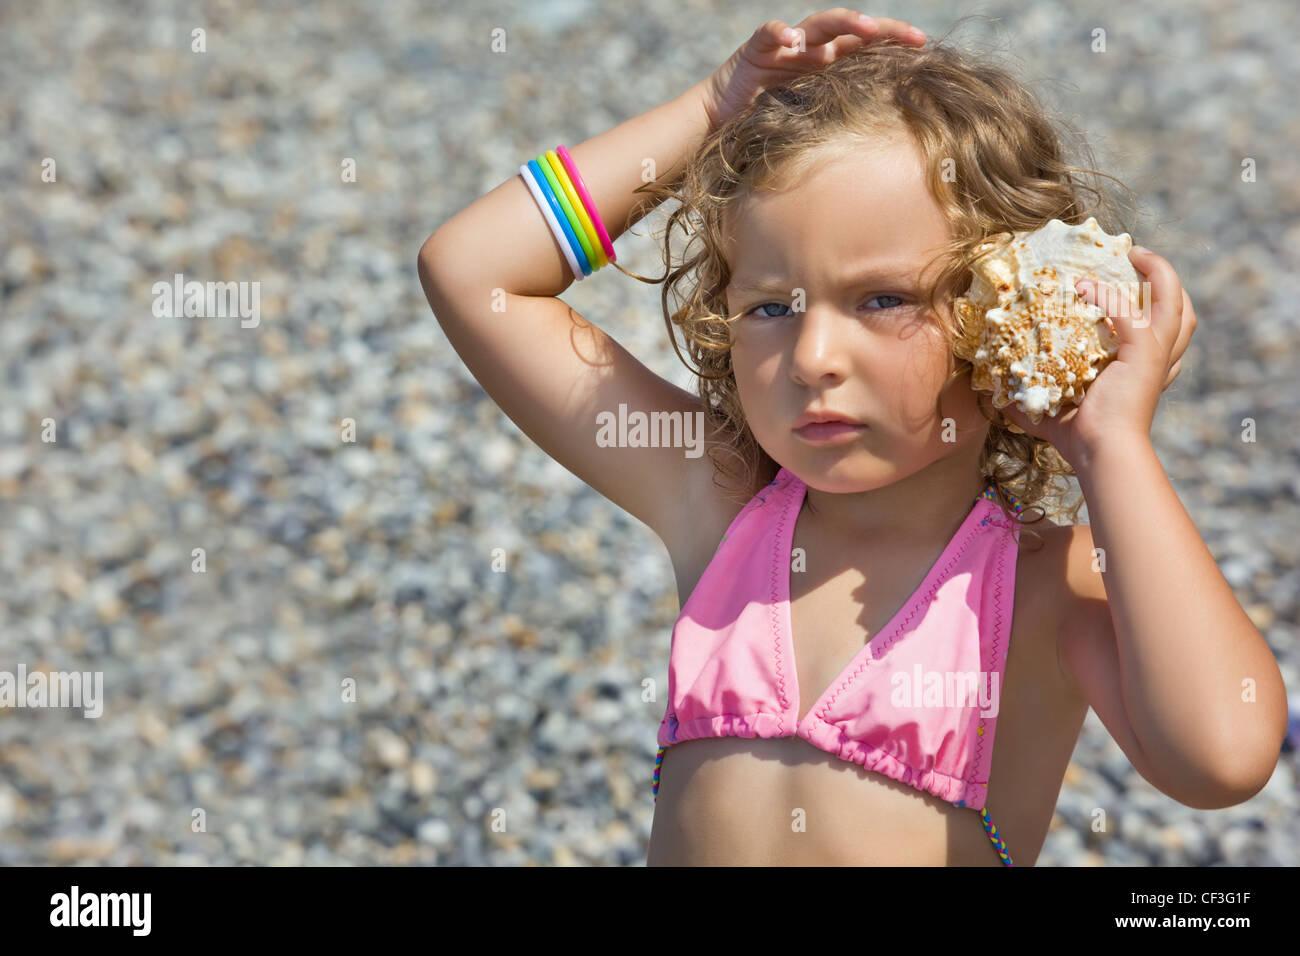 pretty little girl has leant seashell bowl to an ear on seacoast - Stock Image